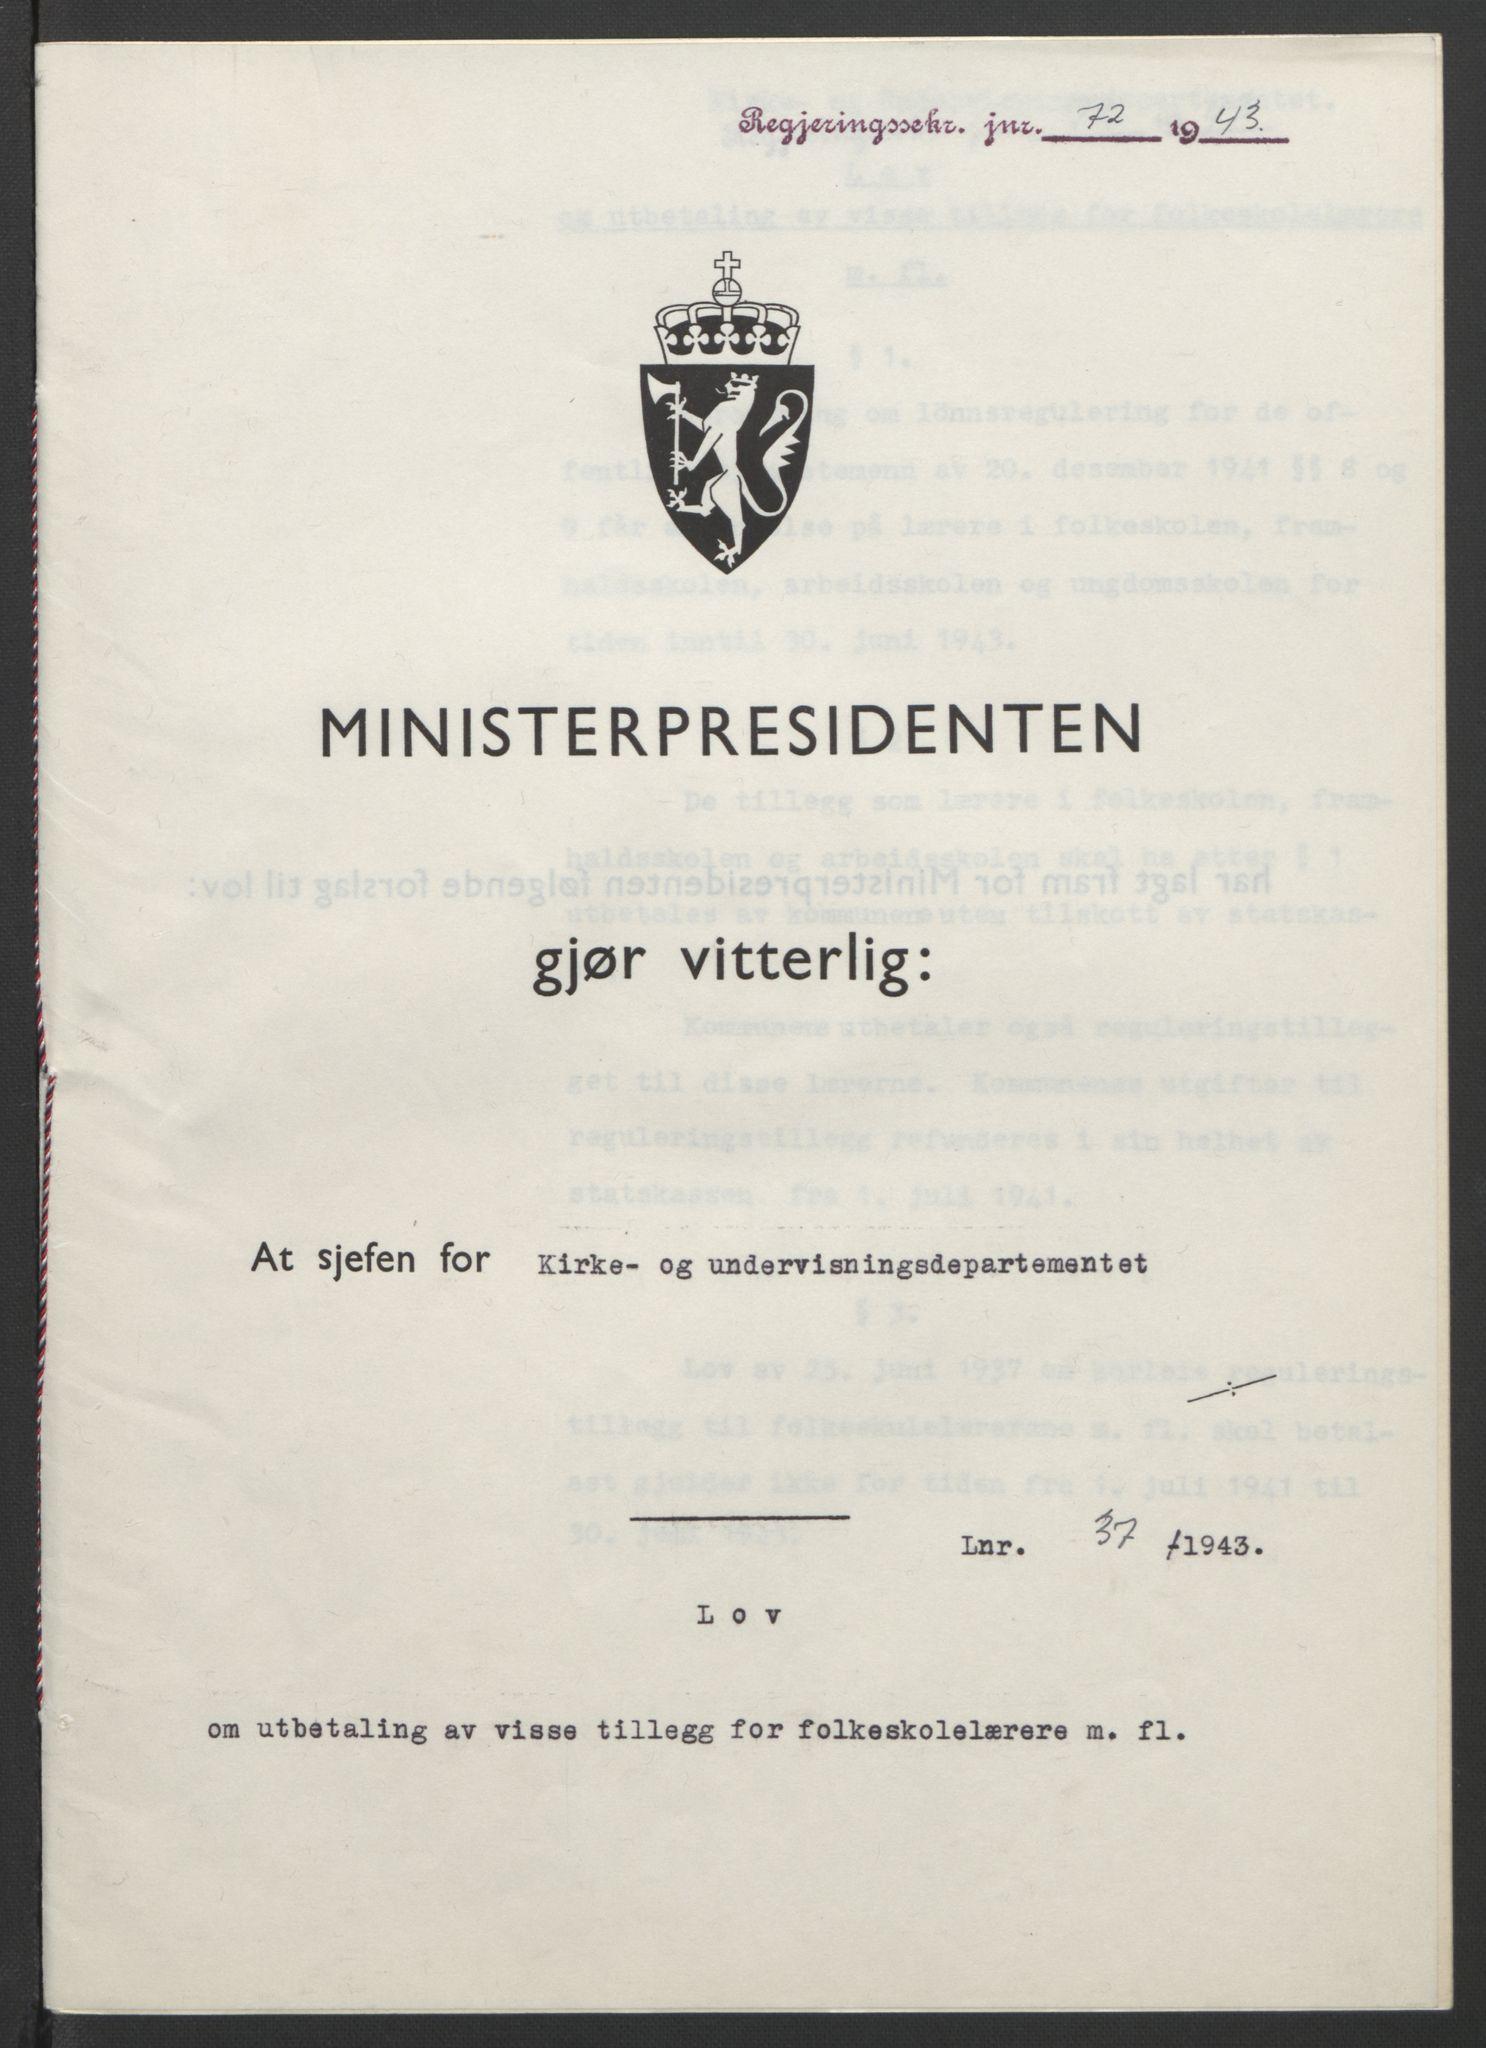 RA, NS-administrasjonen 1940-1945 (Statsrådsekretariatet, de kommisariske statsråder mm), D/Db/L0099: Lover, 1943, s. 158